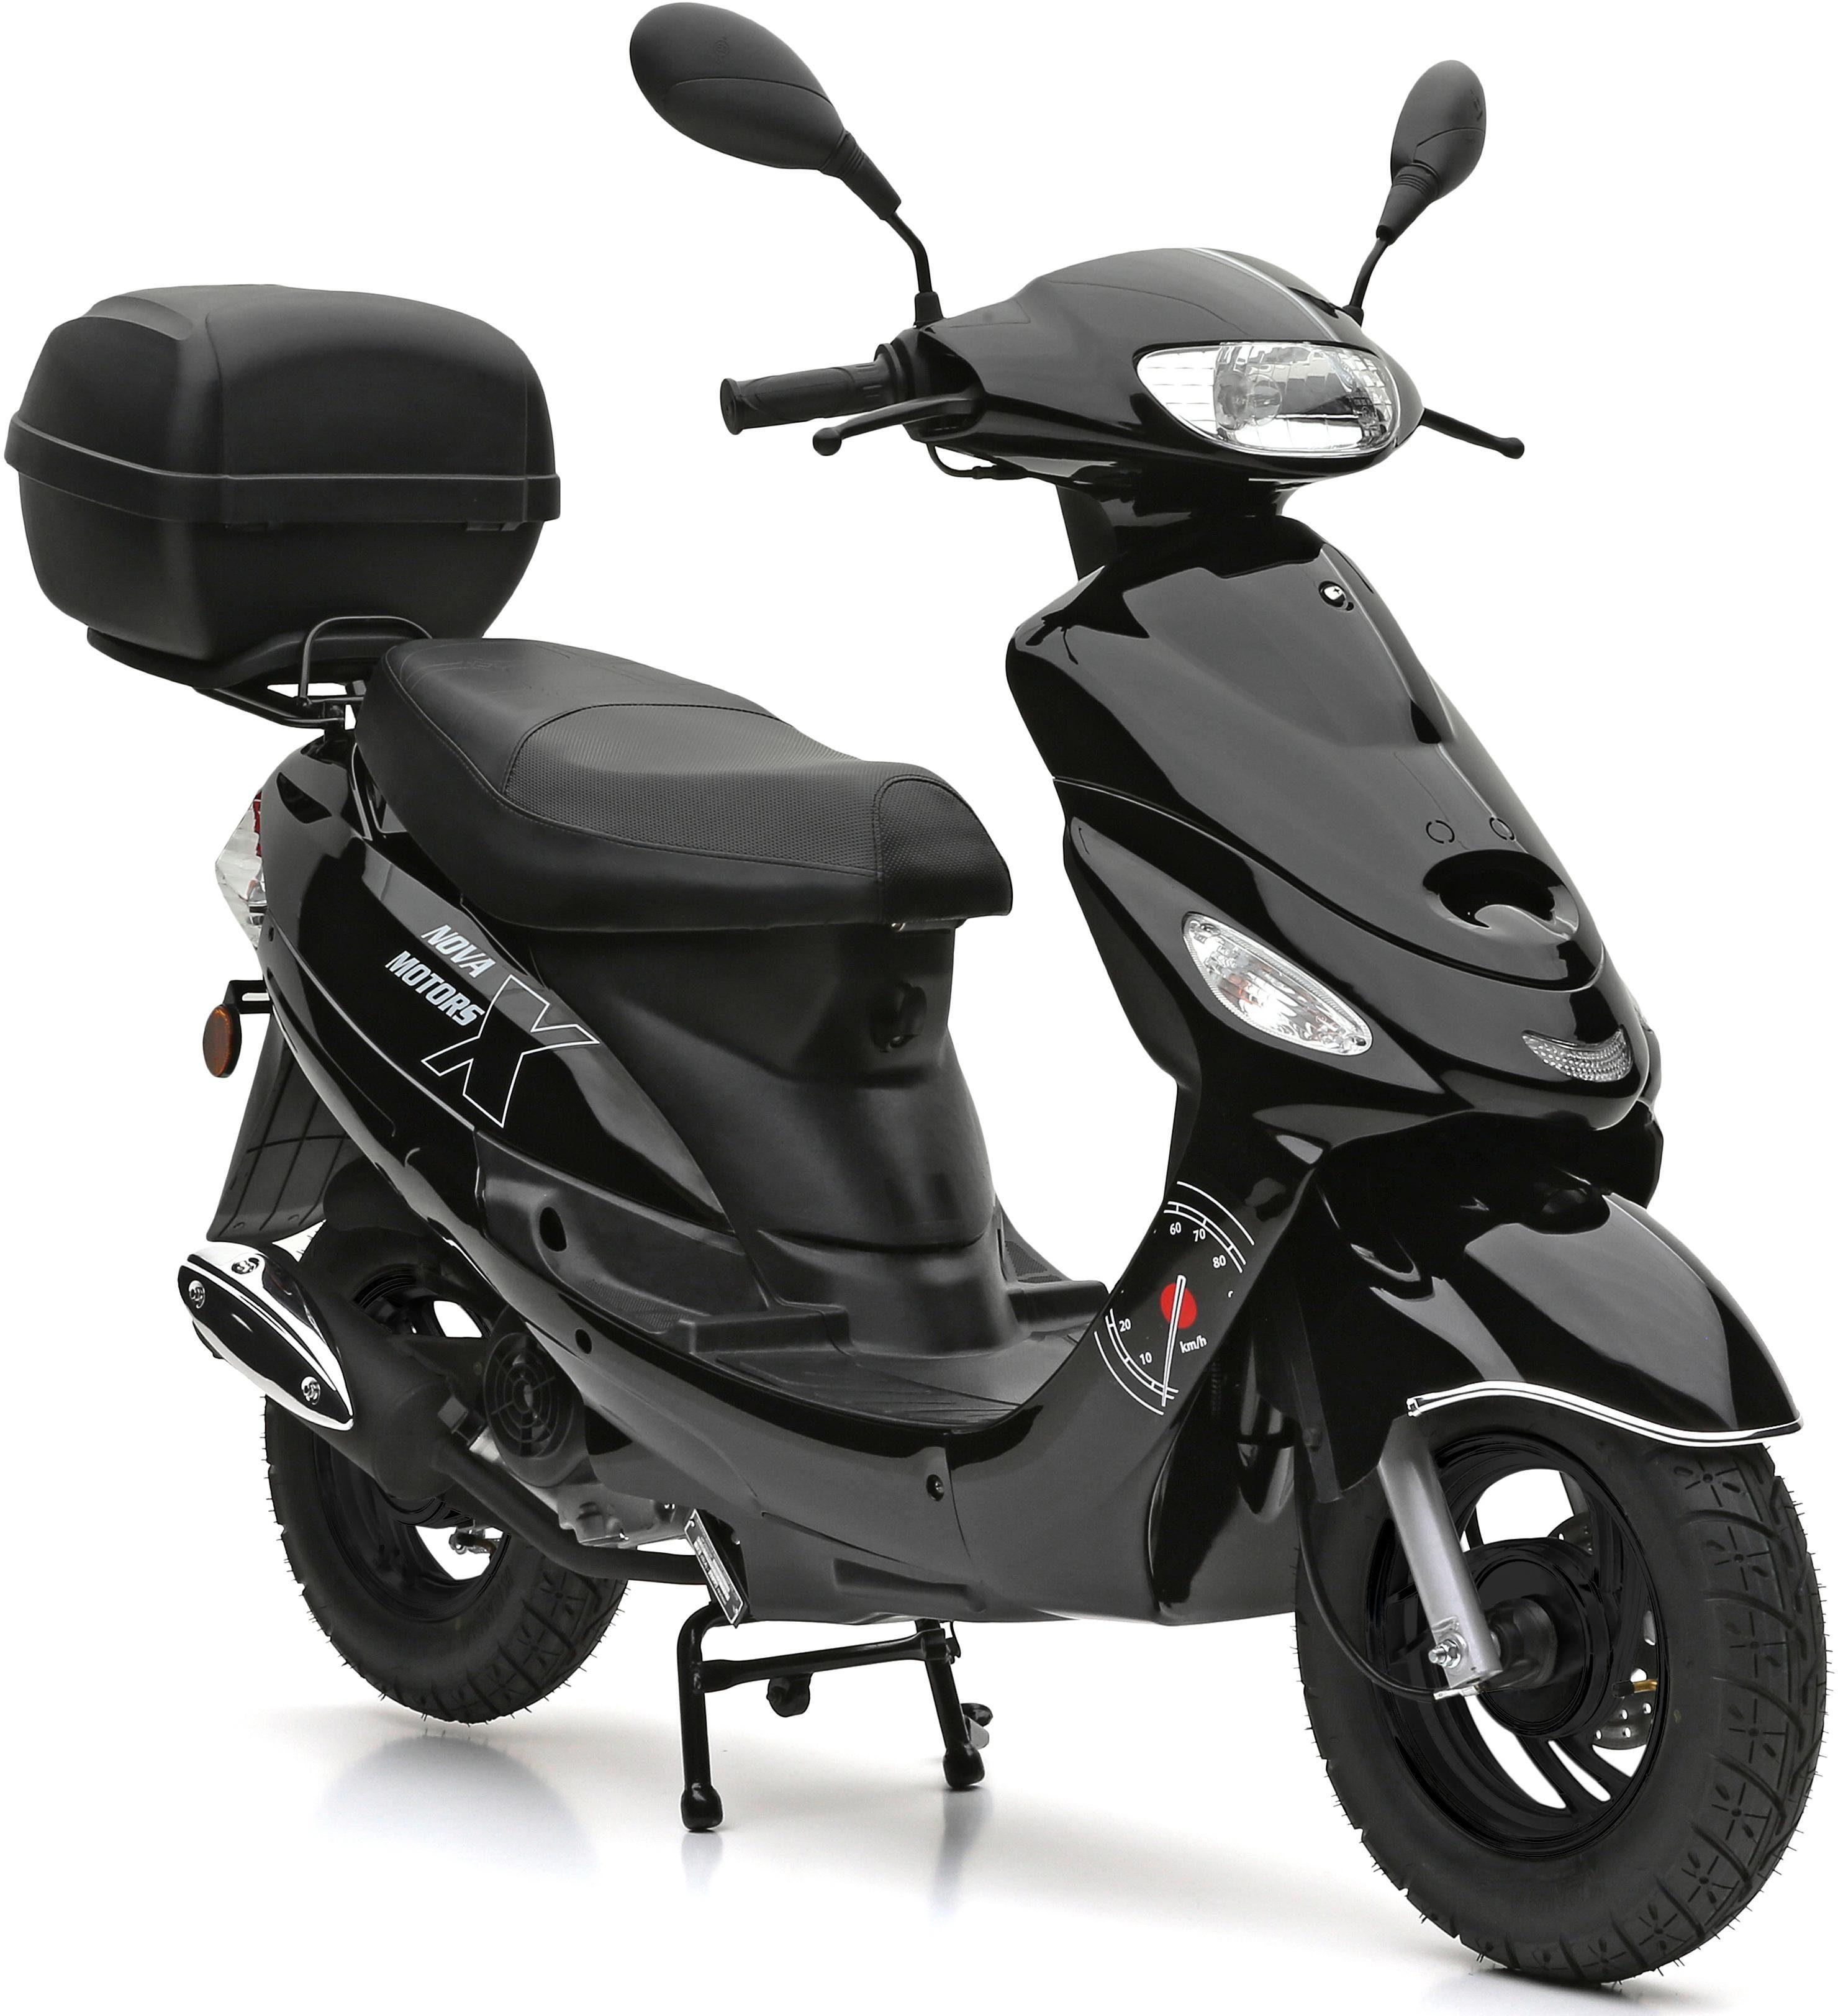 Nova Motors SET: Mofaroller inkl. Topcase, Faltgarage, Kettenschloss, 49-ccm, 25 km/h, »City Star«